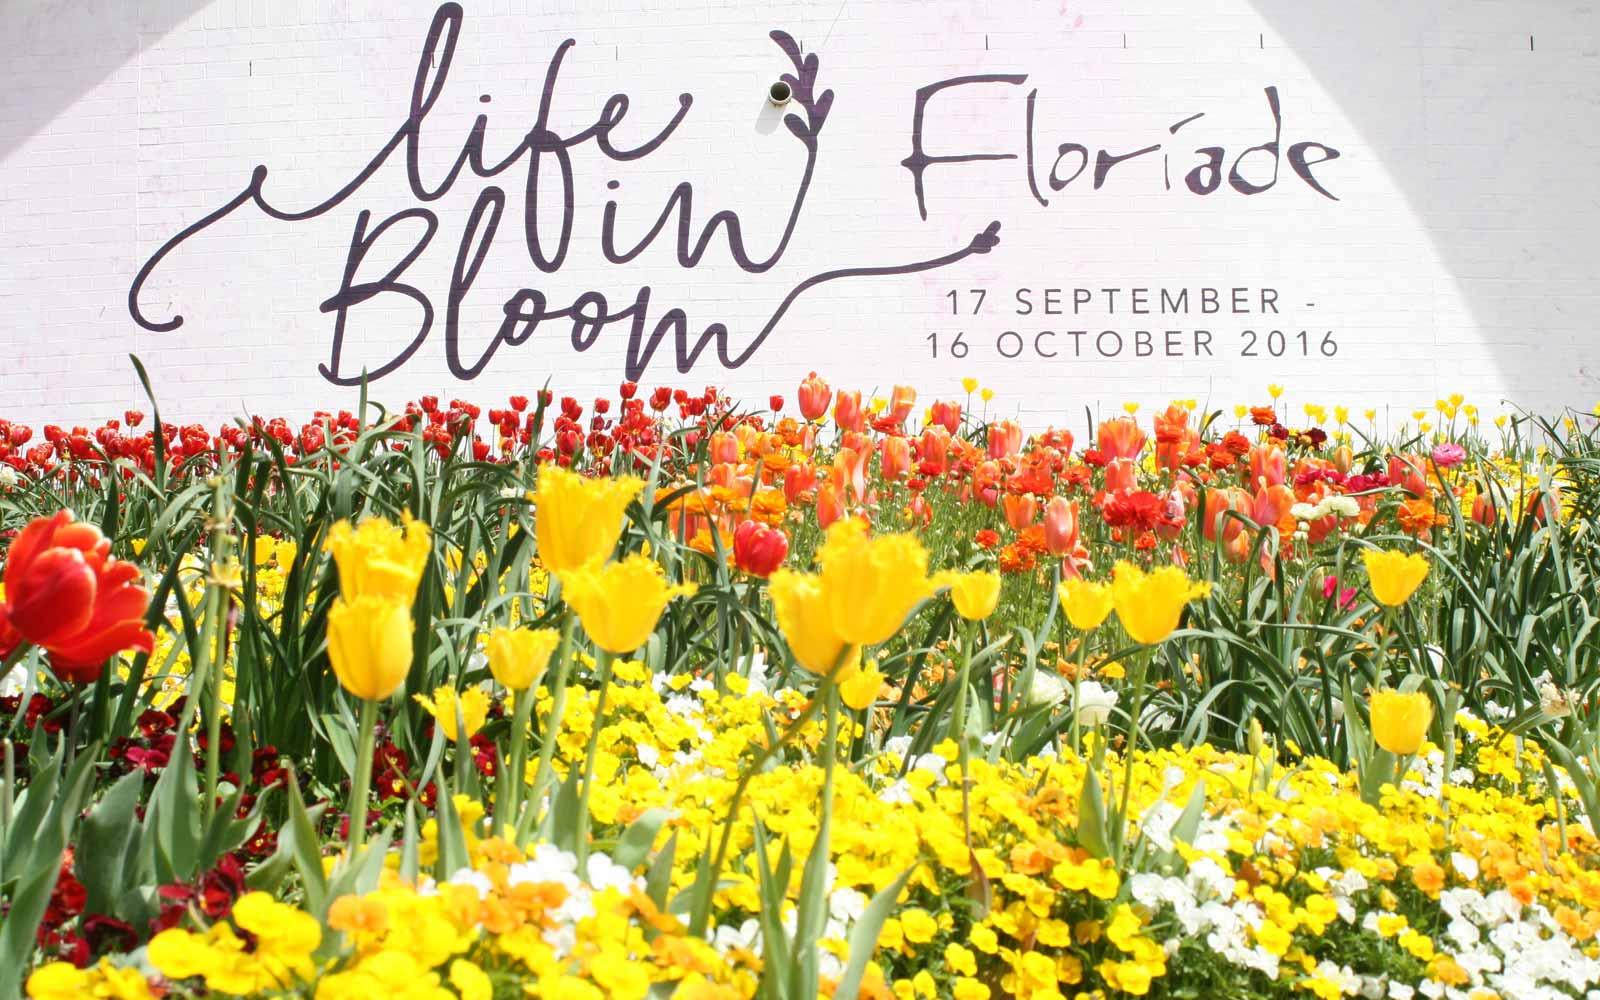 Floriade in Canberra, Australien